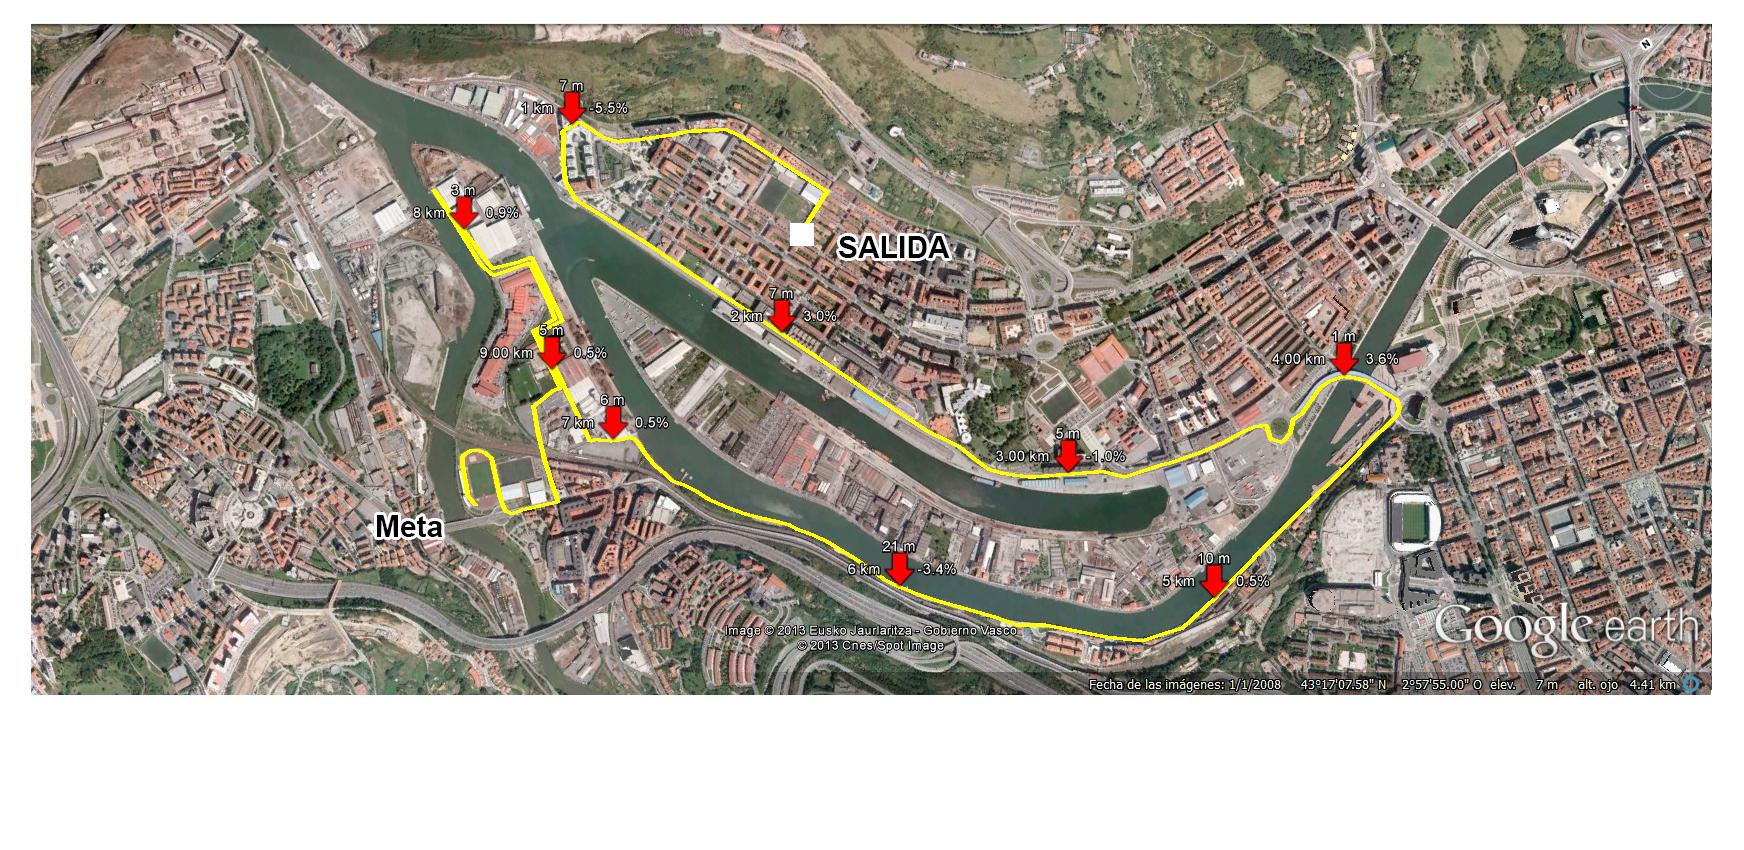 CircuitoBilbao-Bilbao.jpg